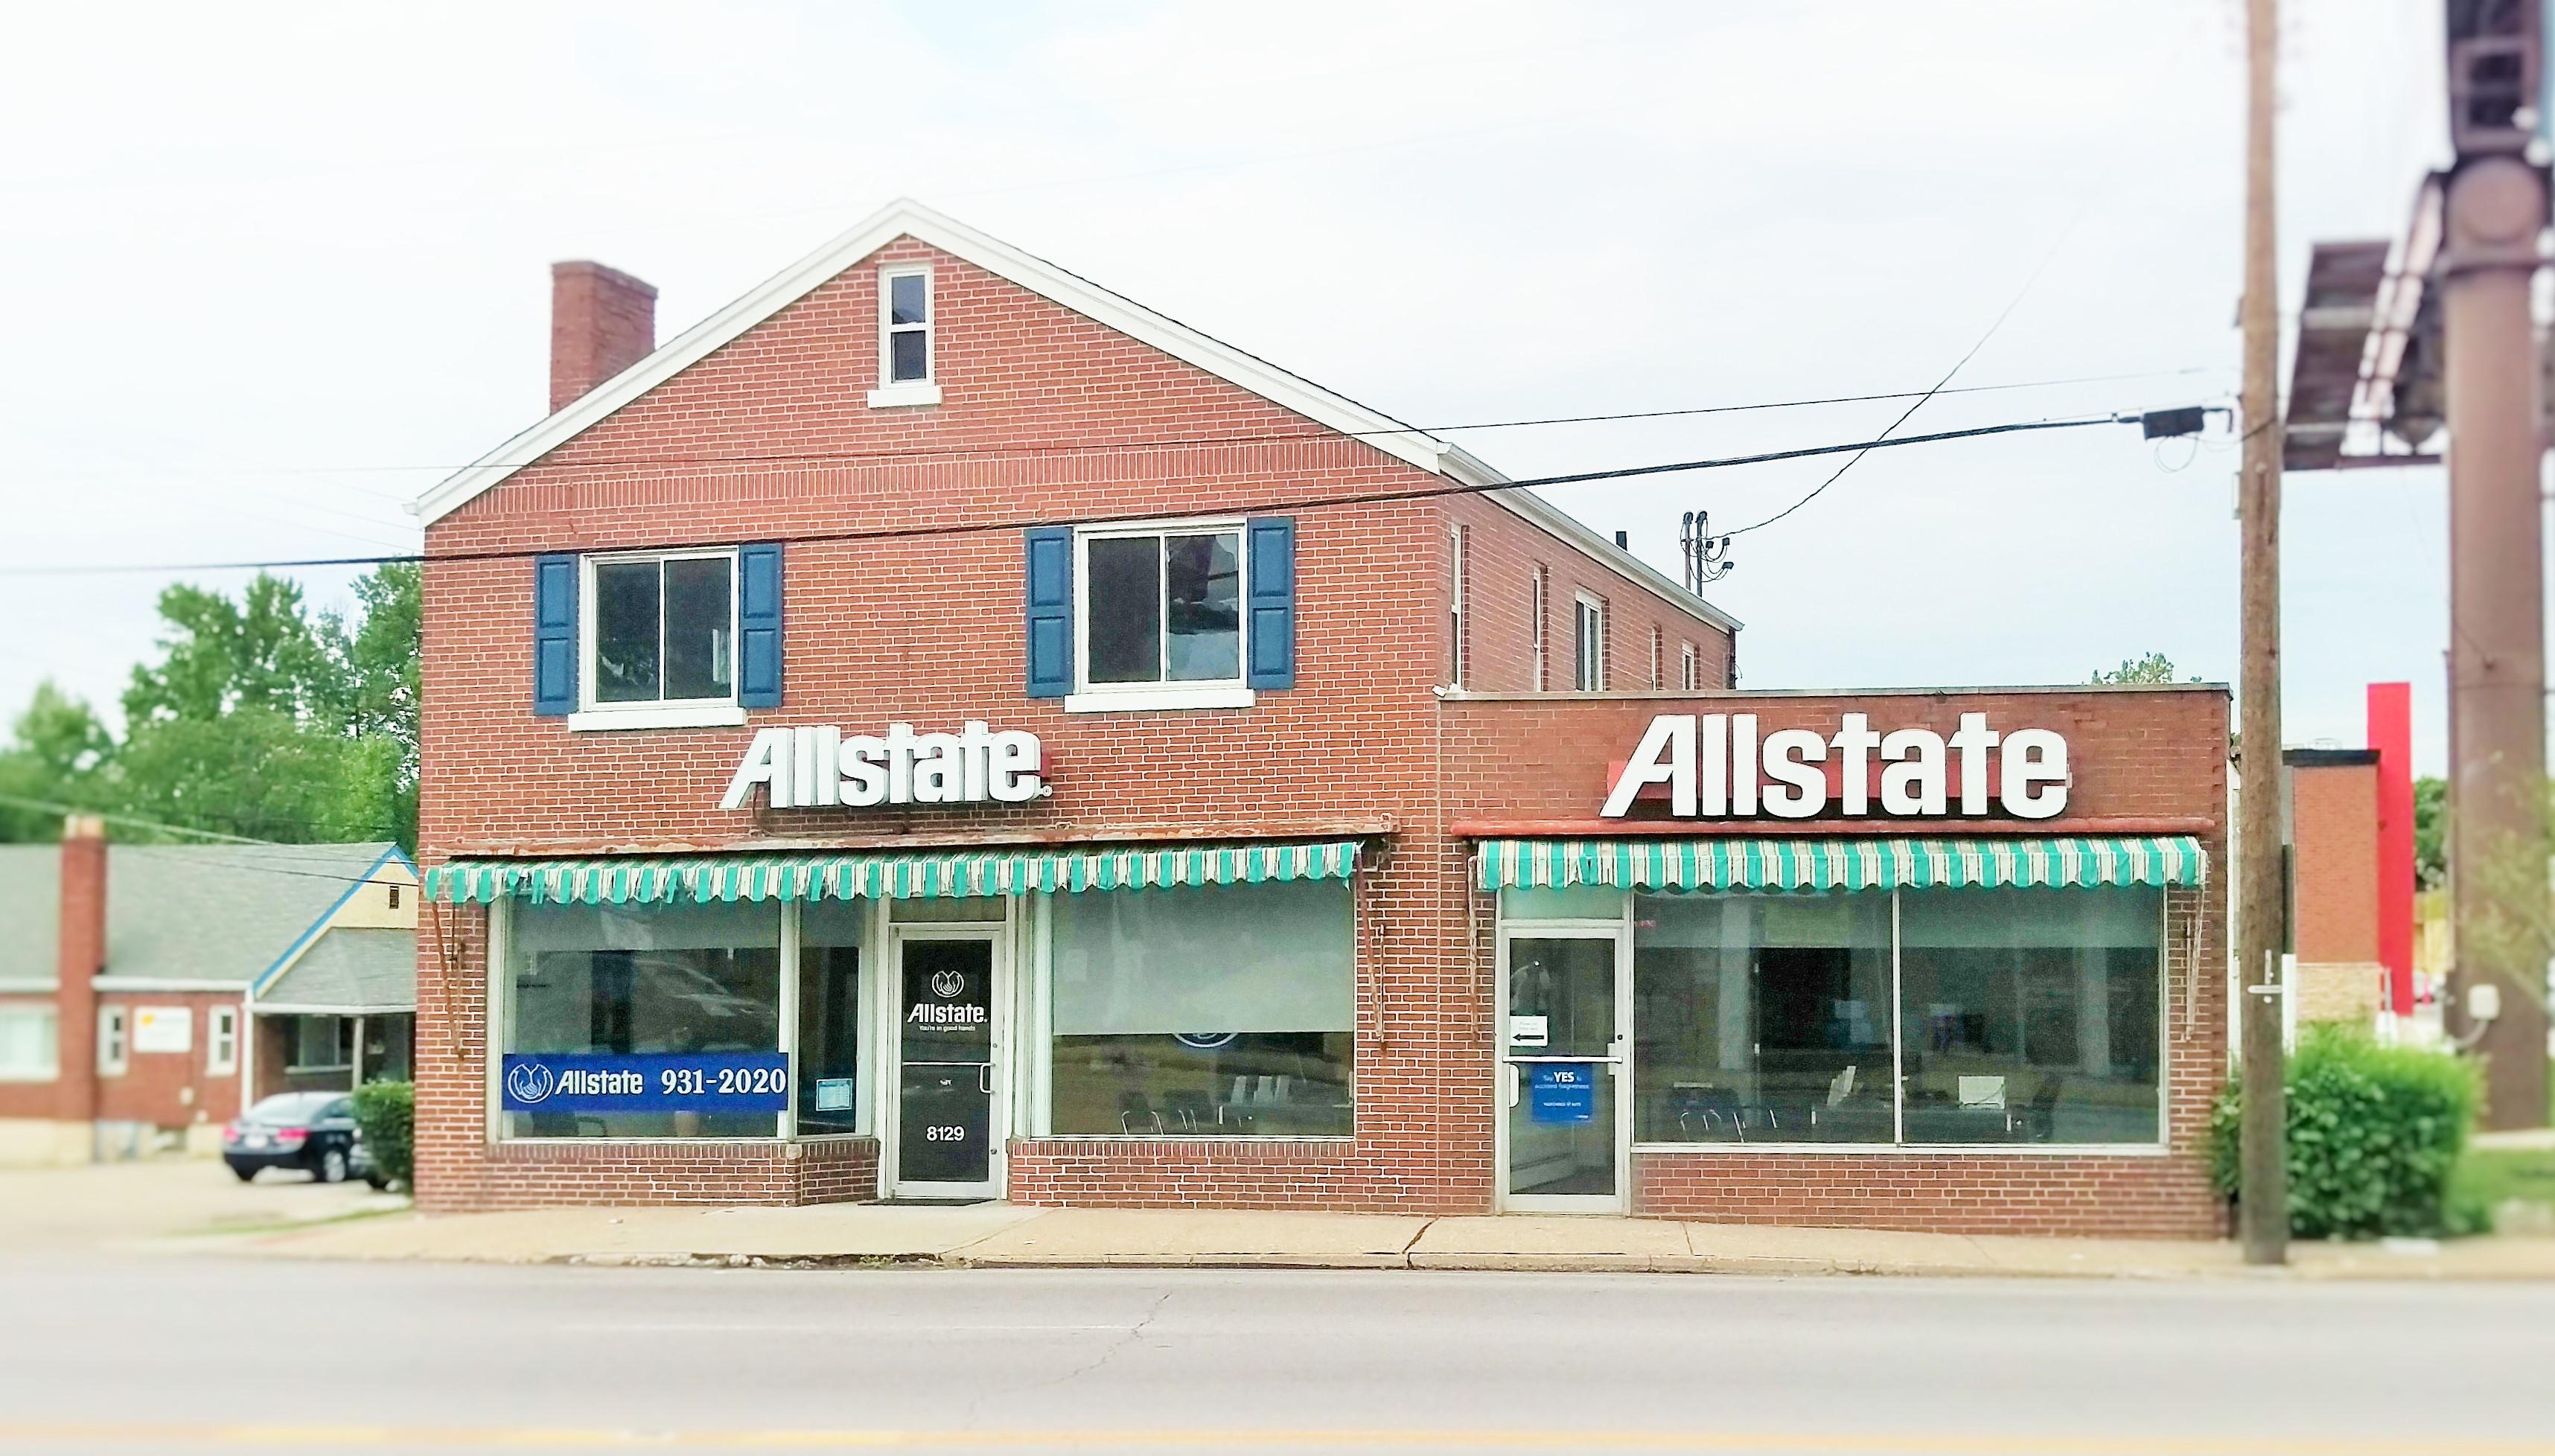 Charlie Broxterman: Allstate Insurance image 5